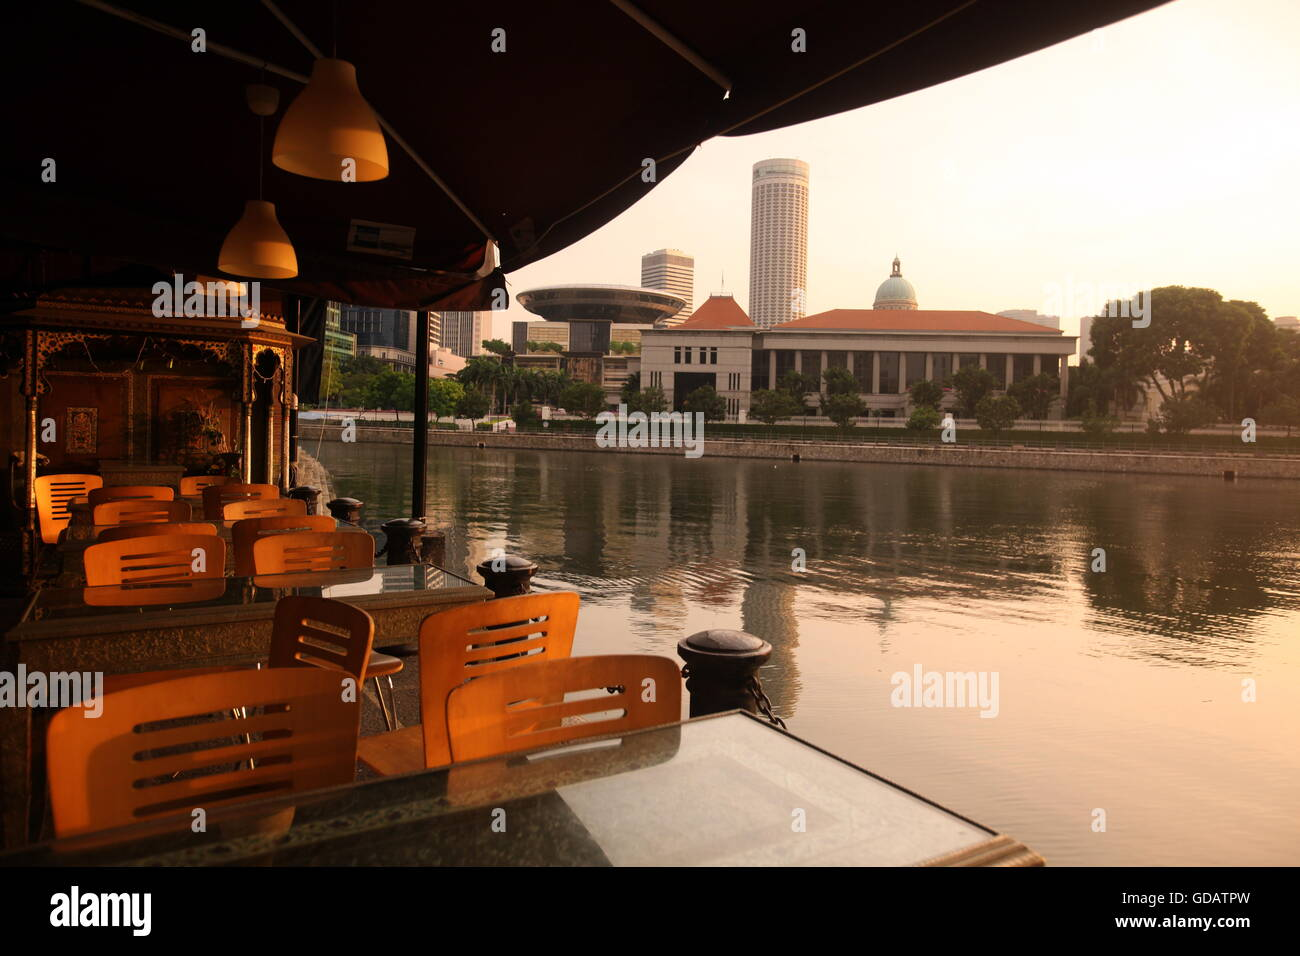 Asien, Suedost, Singapur, Insel, Staat, Stadt, City, Skyline, Zentrum, Boat Quay, Bankenviertel,  Restaurant, Stock Photo